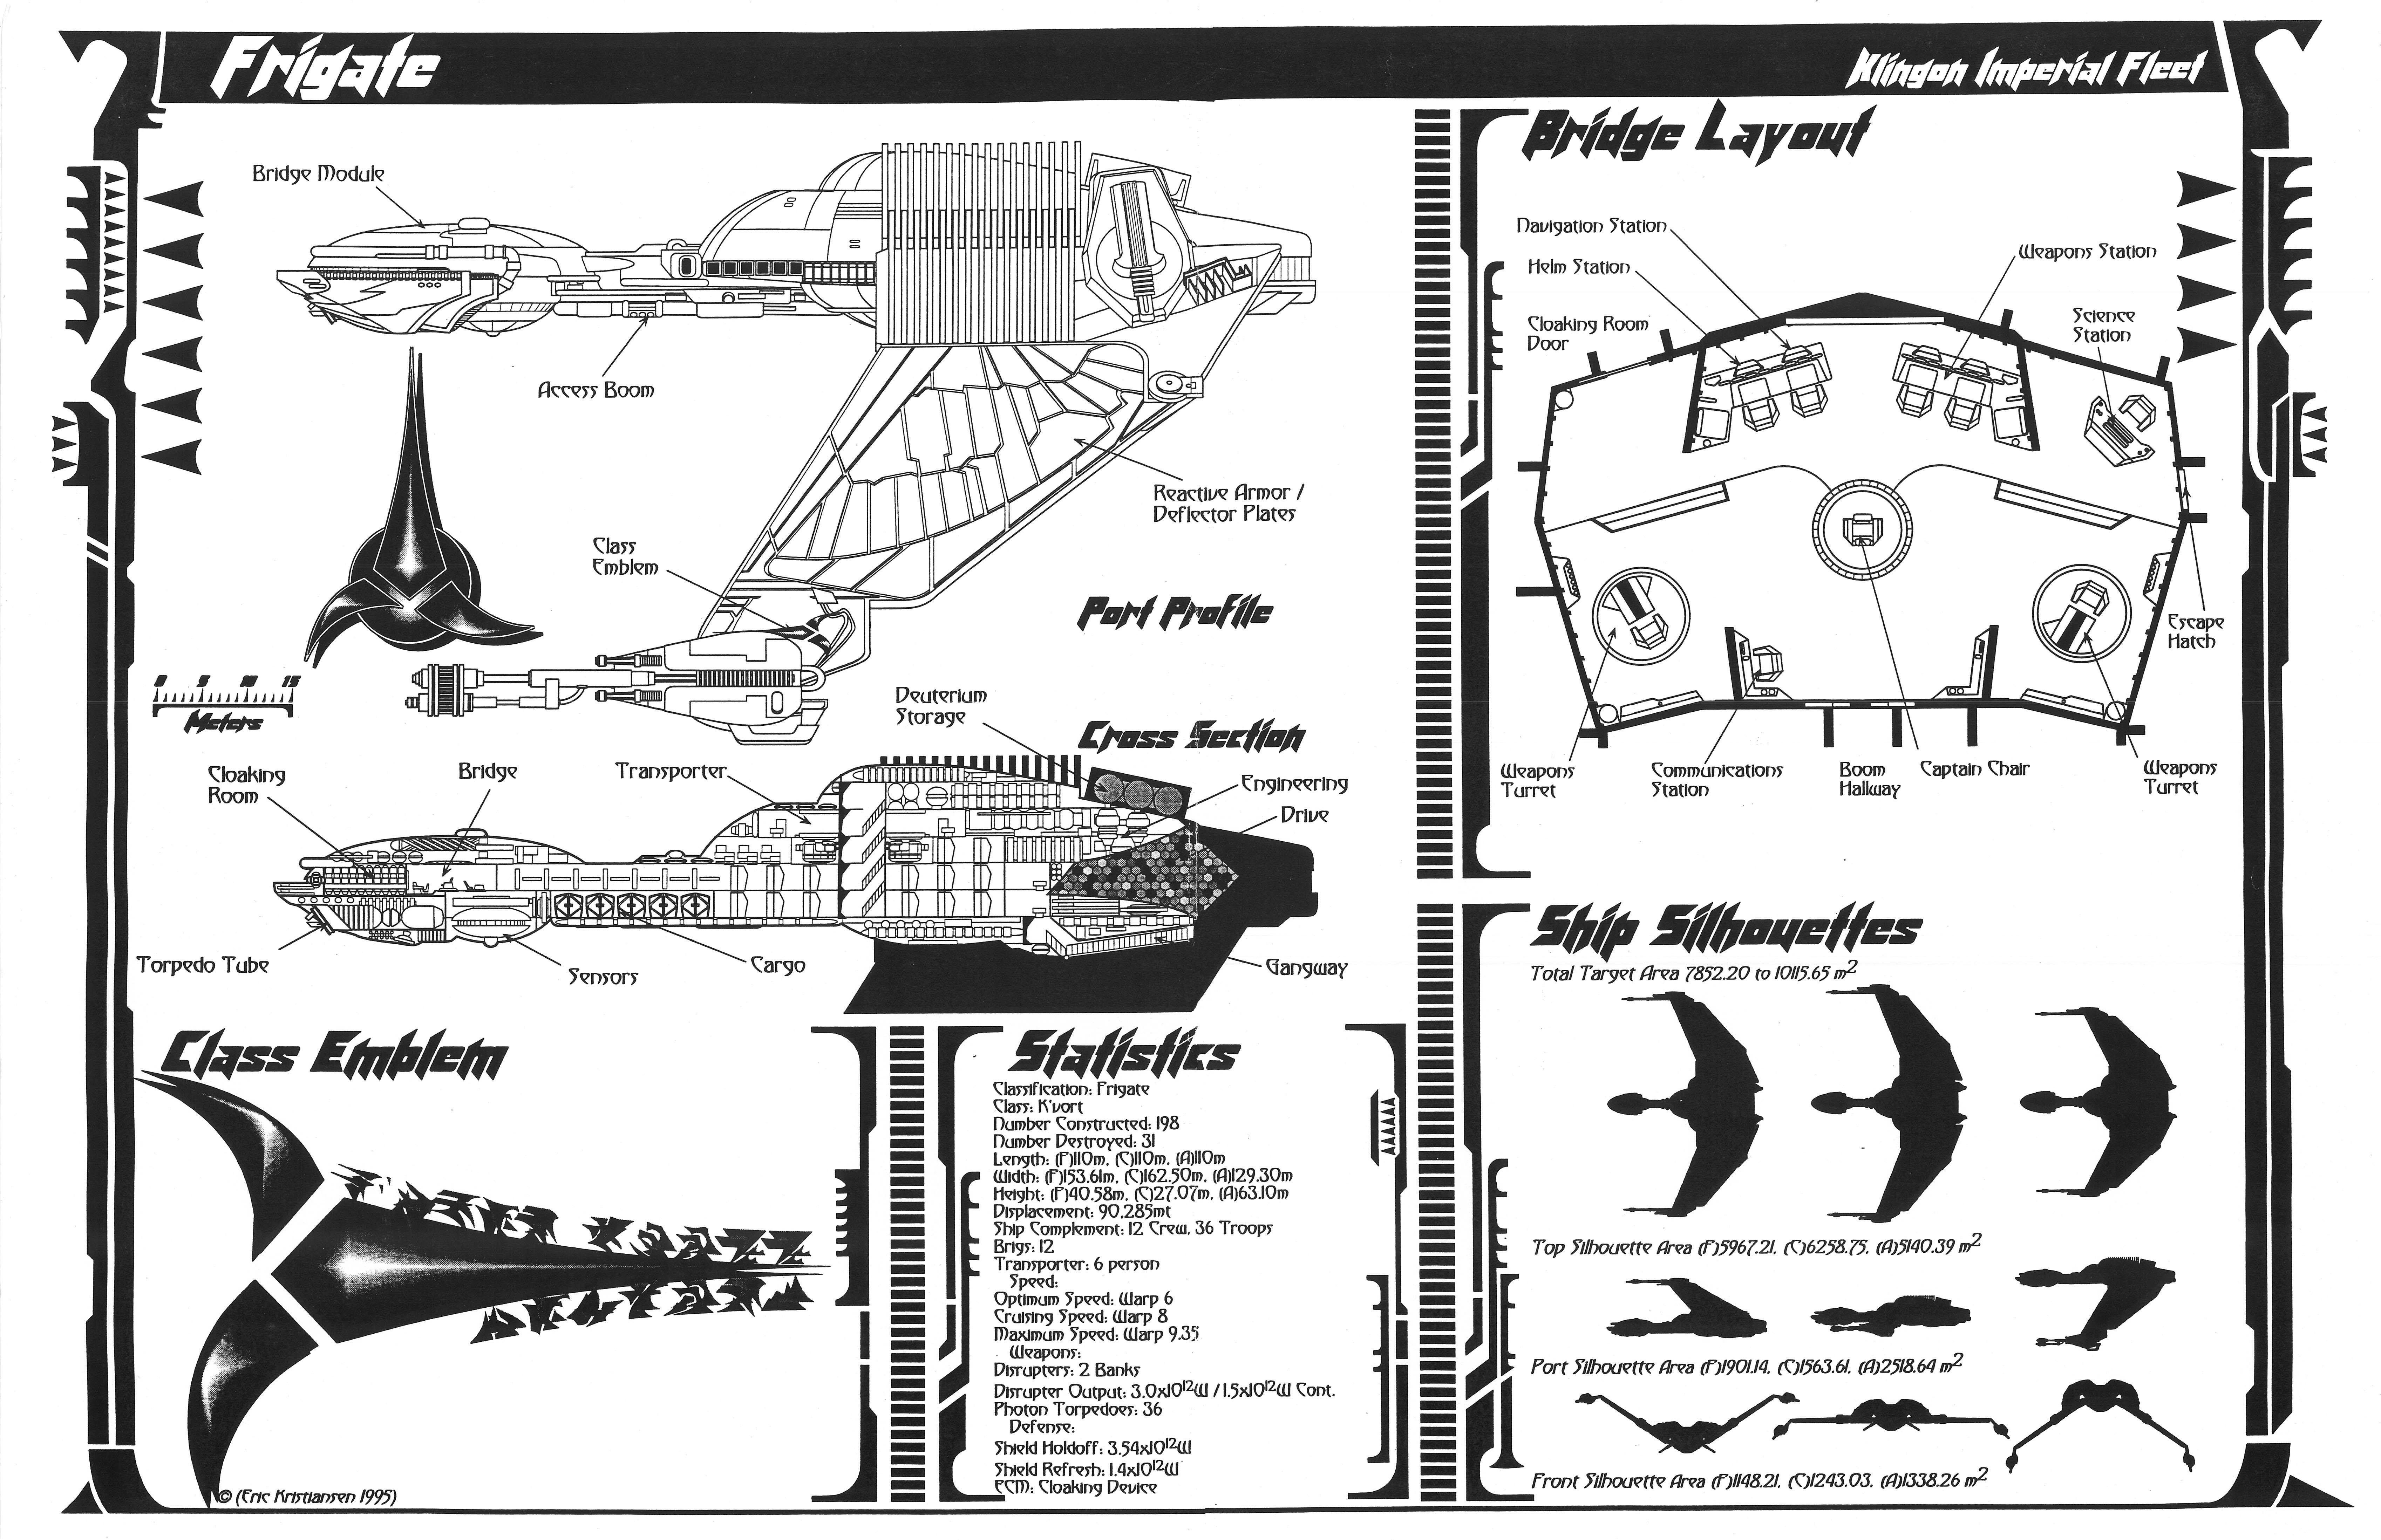 Star Trek Blueprints Jackill S Klingon K Vort Class Frigate